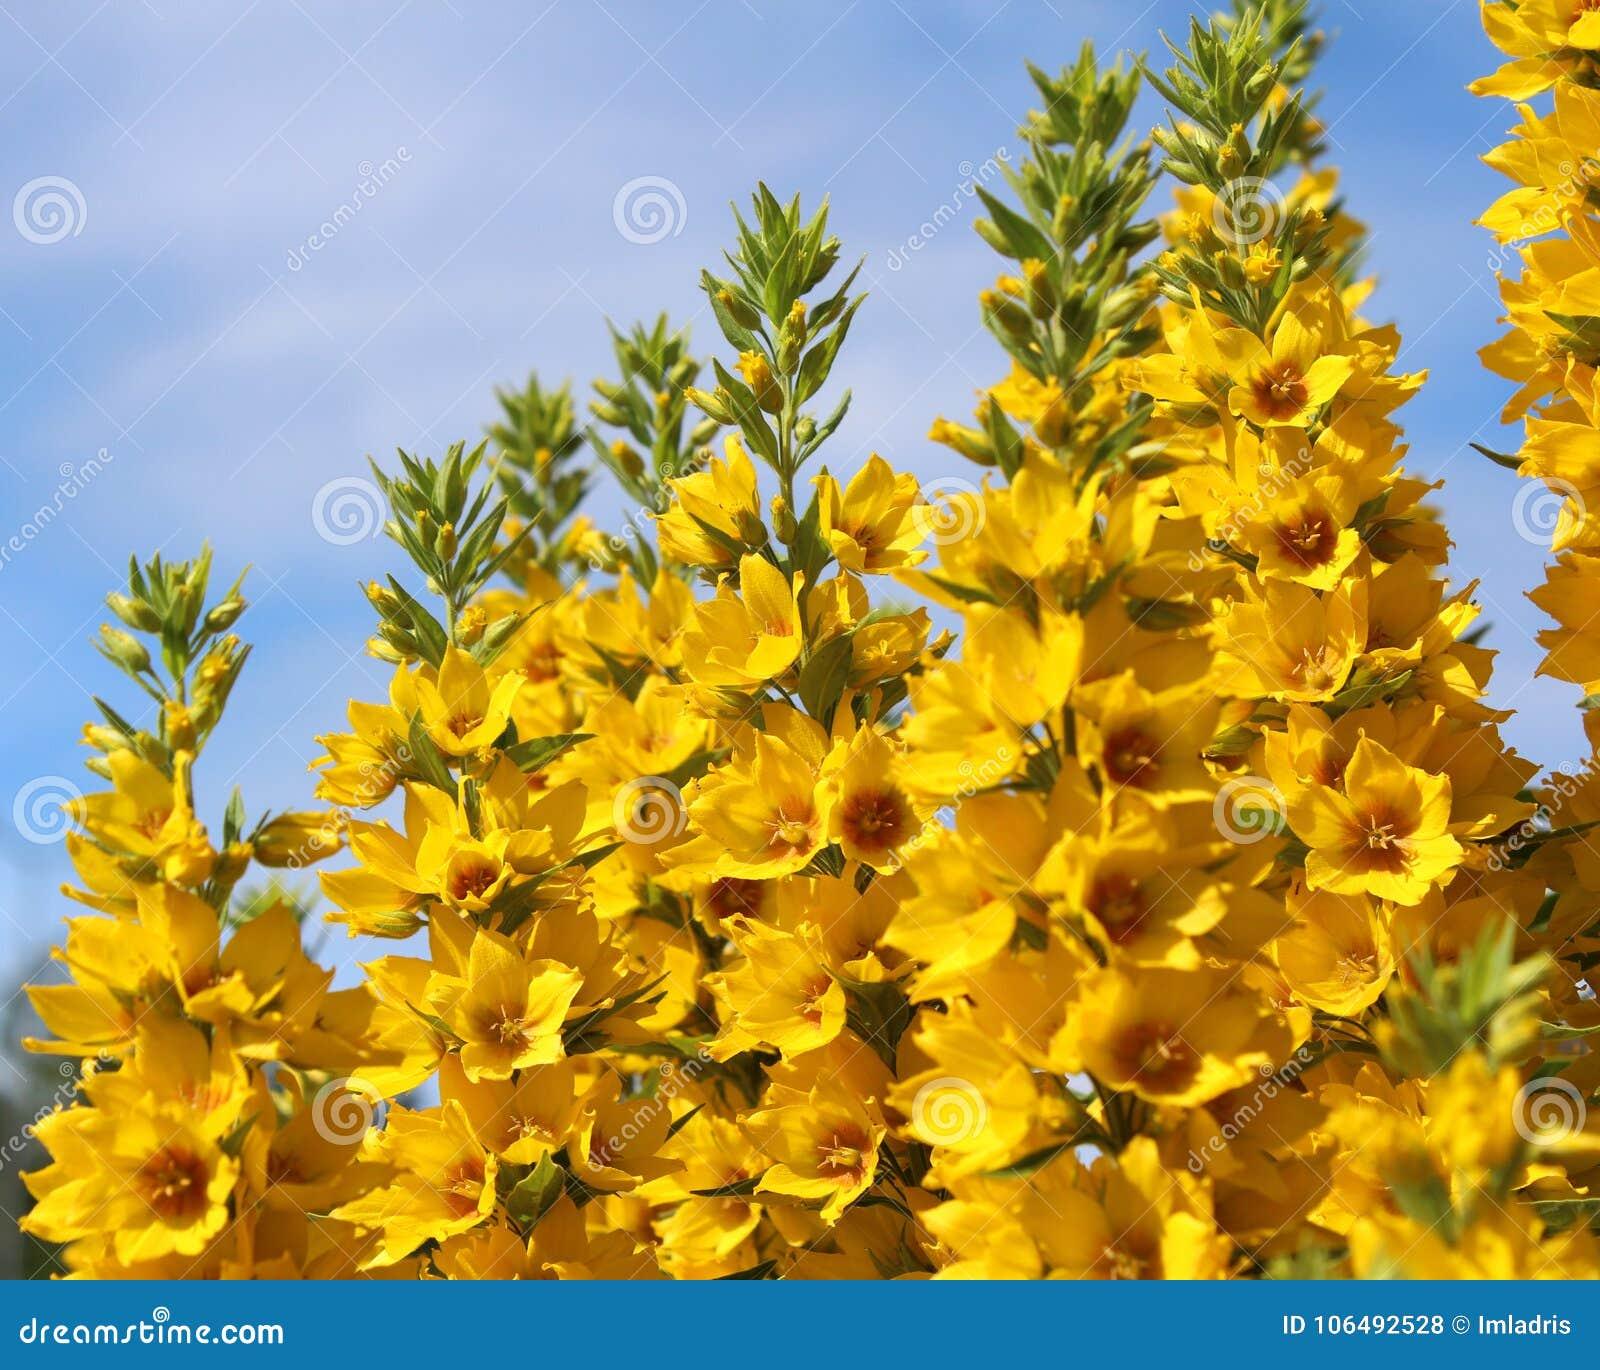 Yellow loosestrife flowers stock photo image of flowering 106492528 download yellow loosestrife flowers stock photo image of flowering 106492528 mightylinksfo